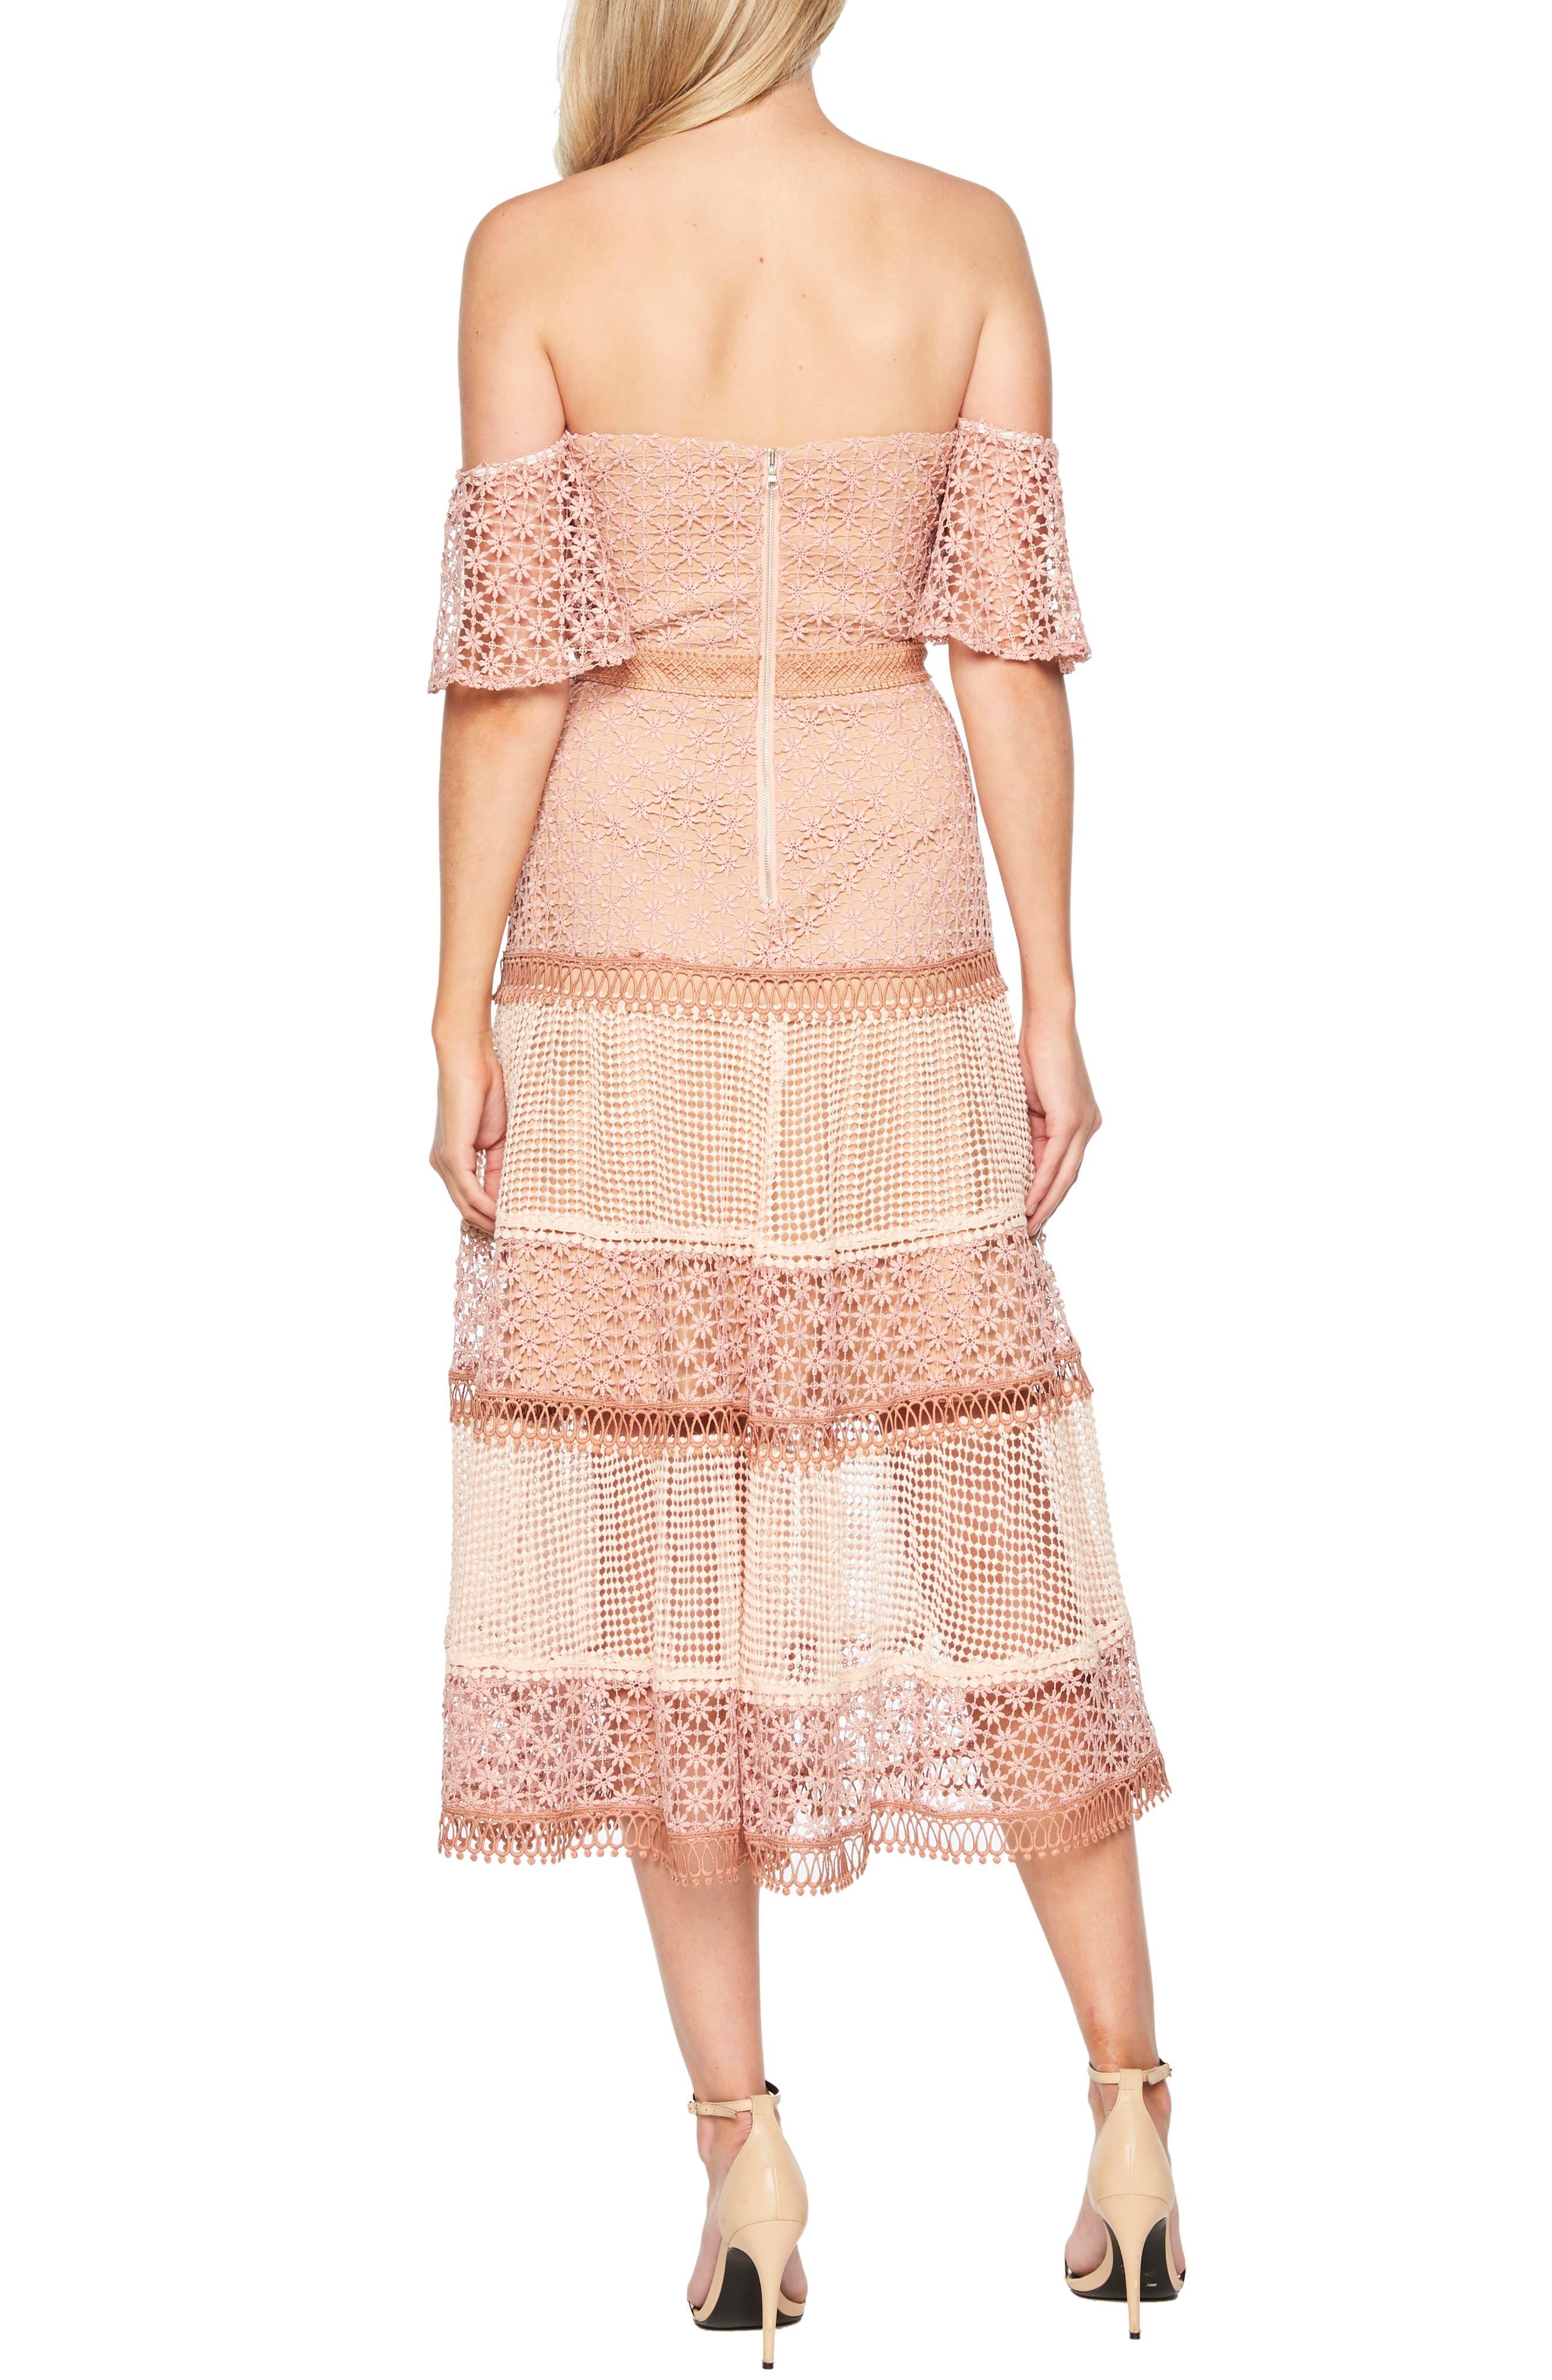 BARDOT, Kristen Off the Shoulder Lace Midi Dress, Alternate thumbnail 2, color, 680